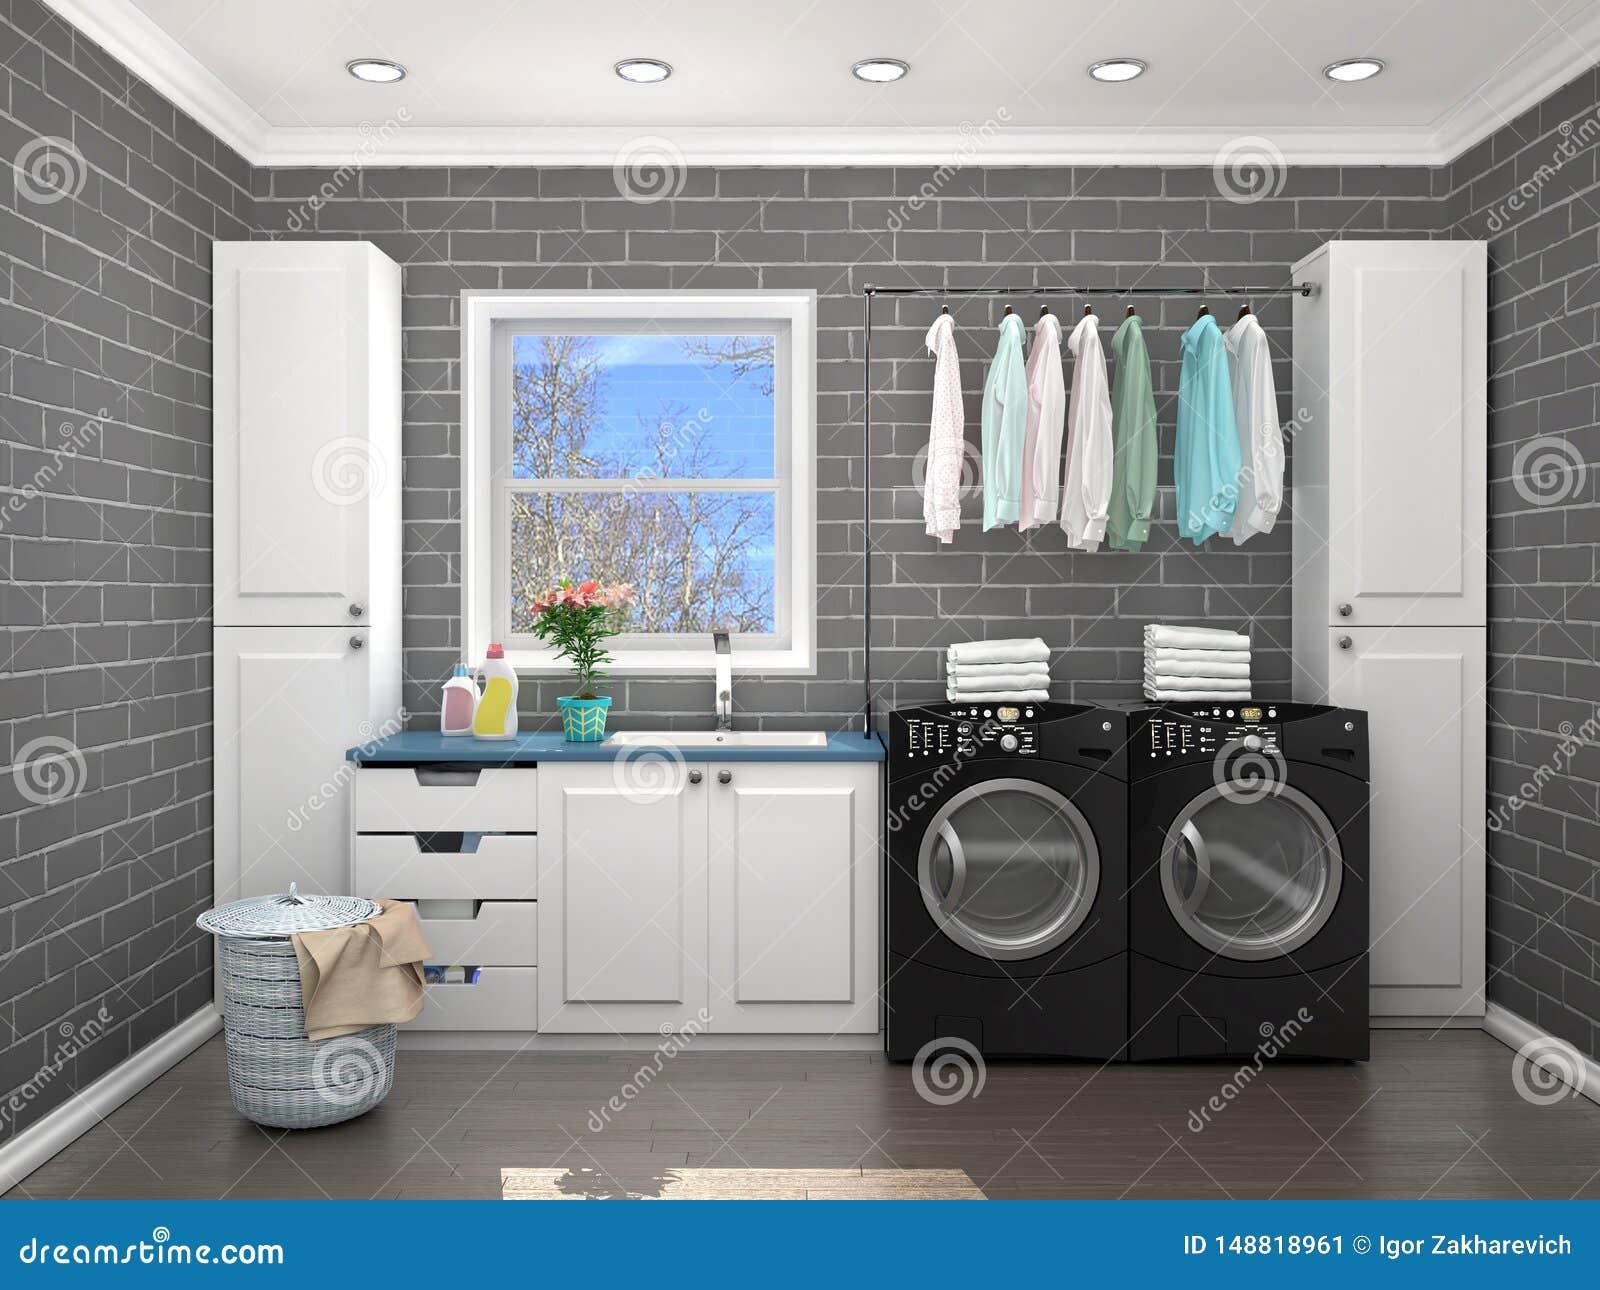 Laundry Room Design with Washing Machine. Stock Illustration ...